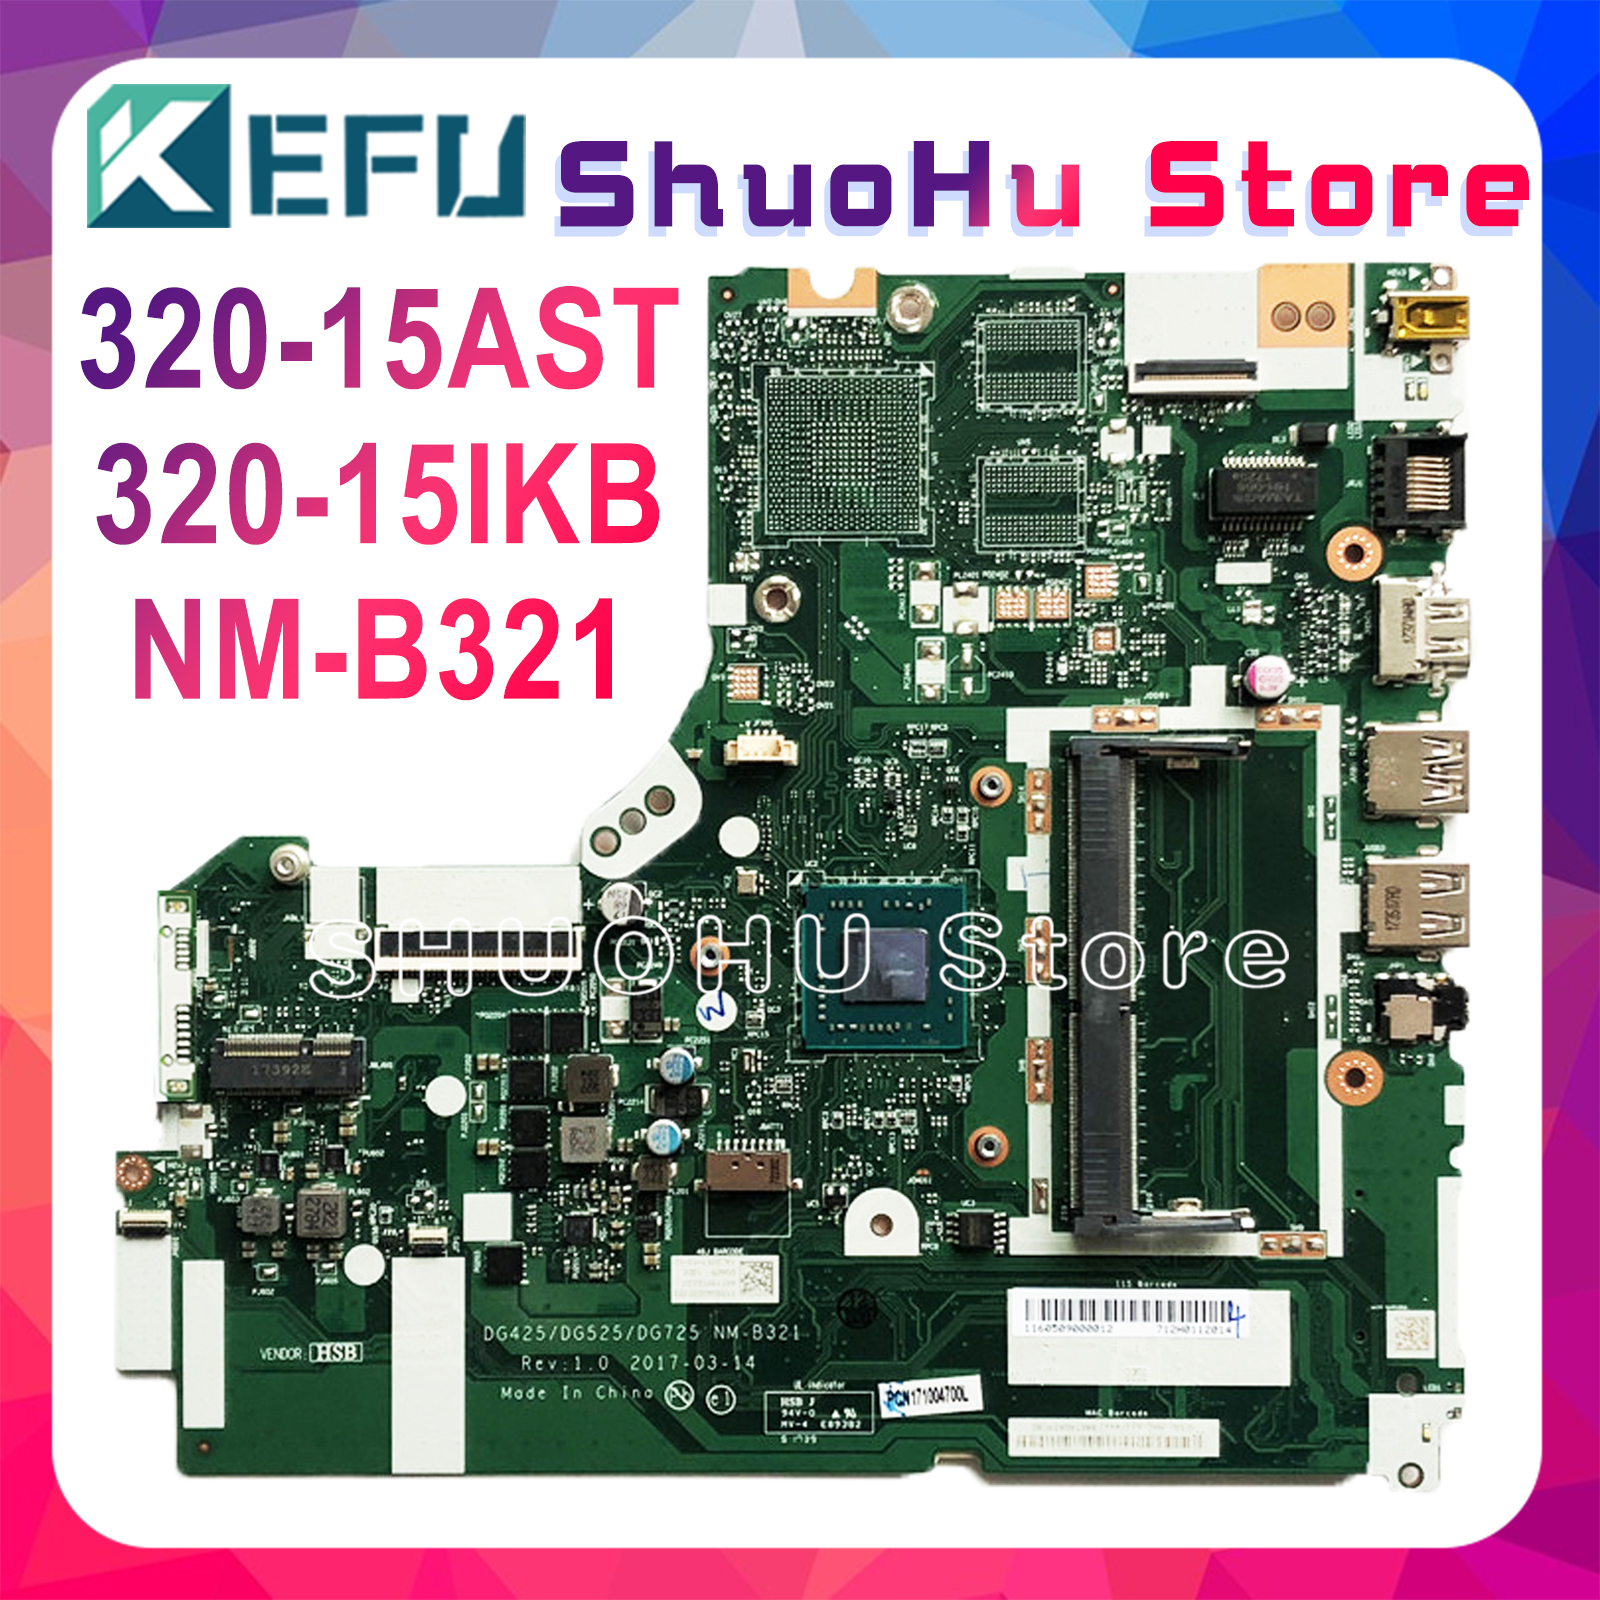 KEFU NM-B321 Motherboard For Lenovo 320-15IKB 320-15AST Motherboard DG425 DG525 DG725 NM-B321 A9-AM9420 CPU Test Original Work